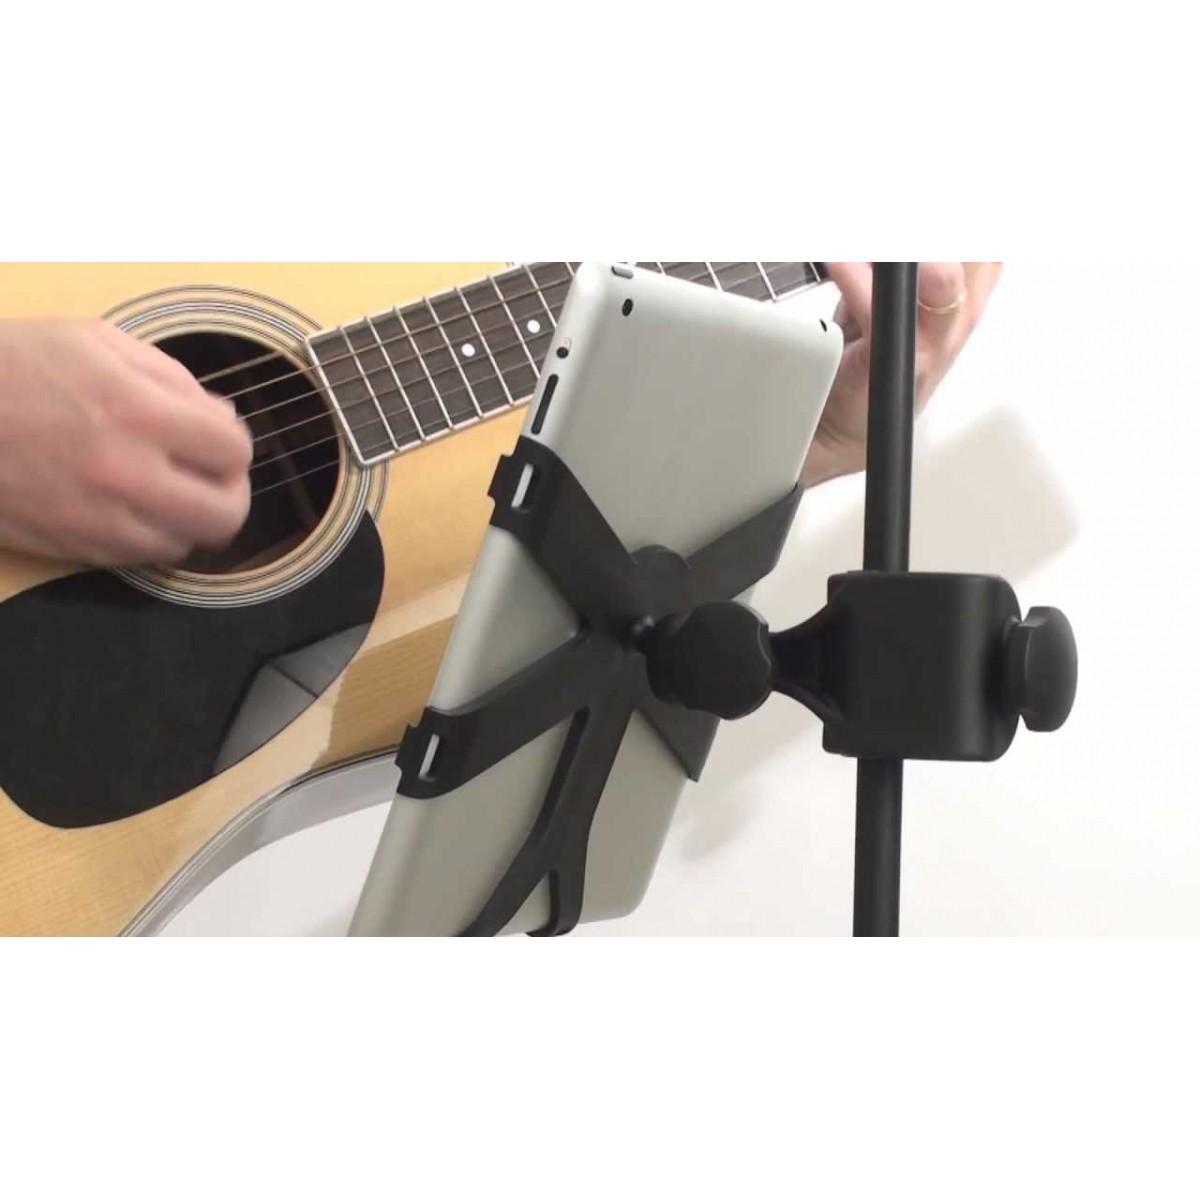 Iklip 2 - Suporte Para Ipad mini - Pedestal De Microfone